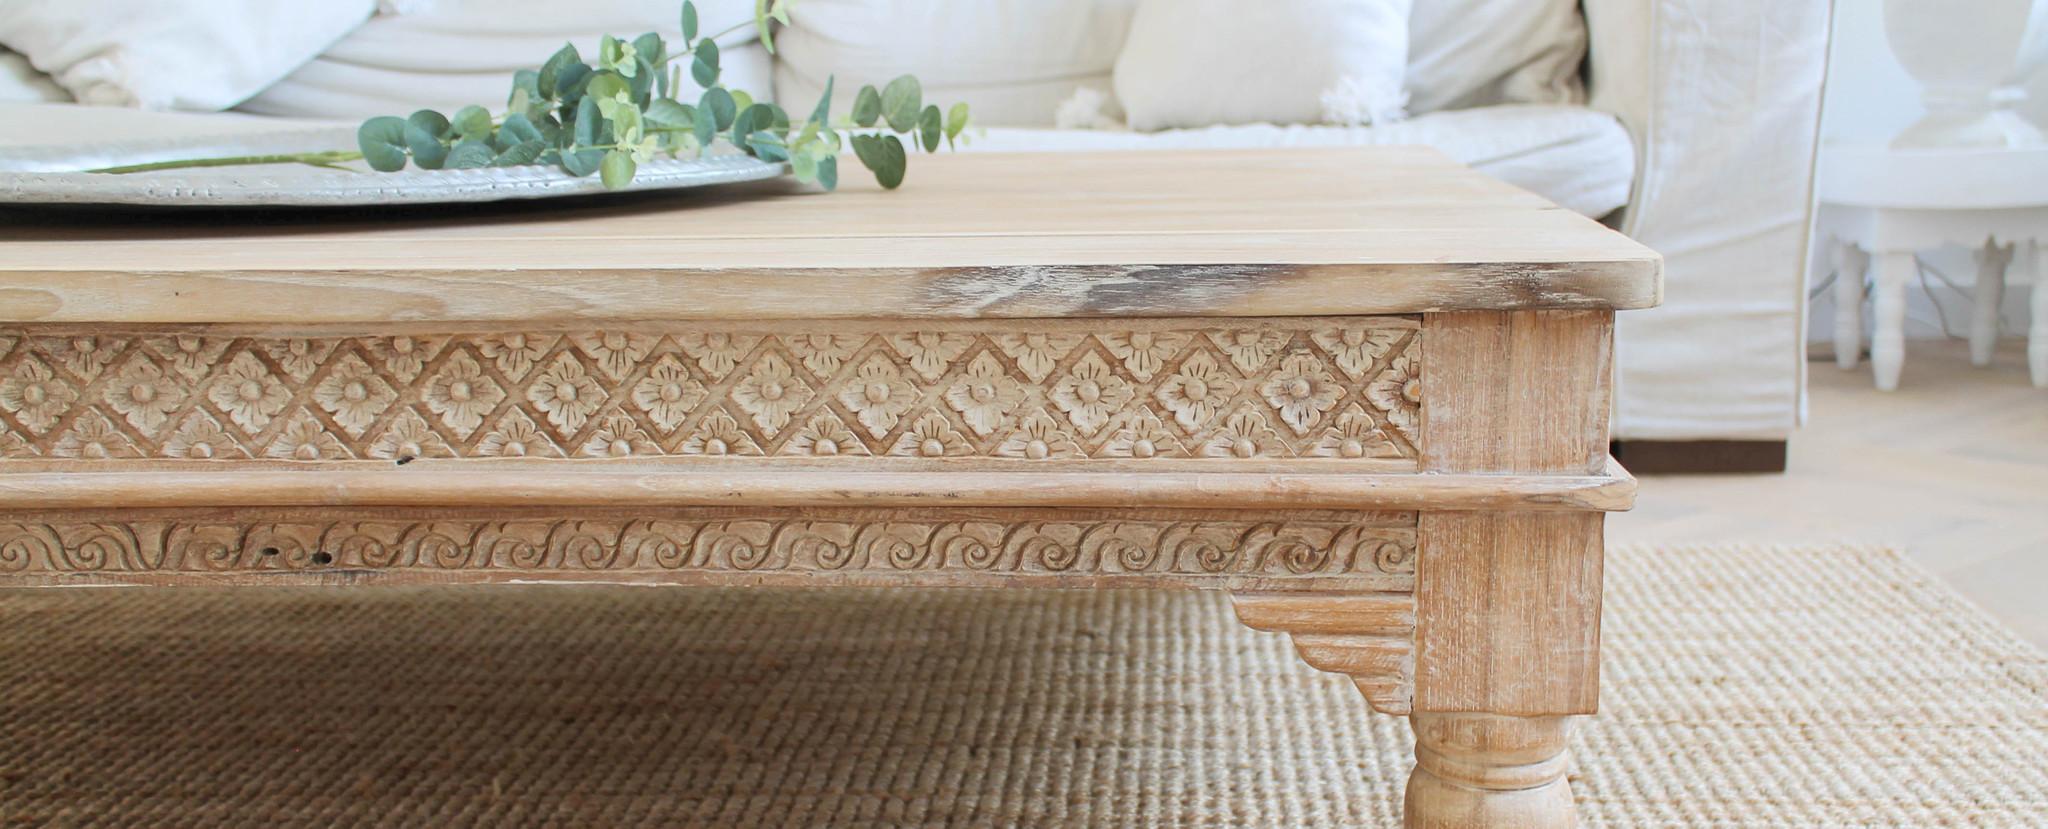 SIMPLY PURE Holzschnitzerei geschnitzte Wandpanelen Wanddekoration Wandkunst aus Holz